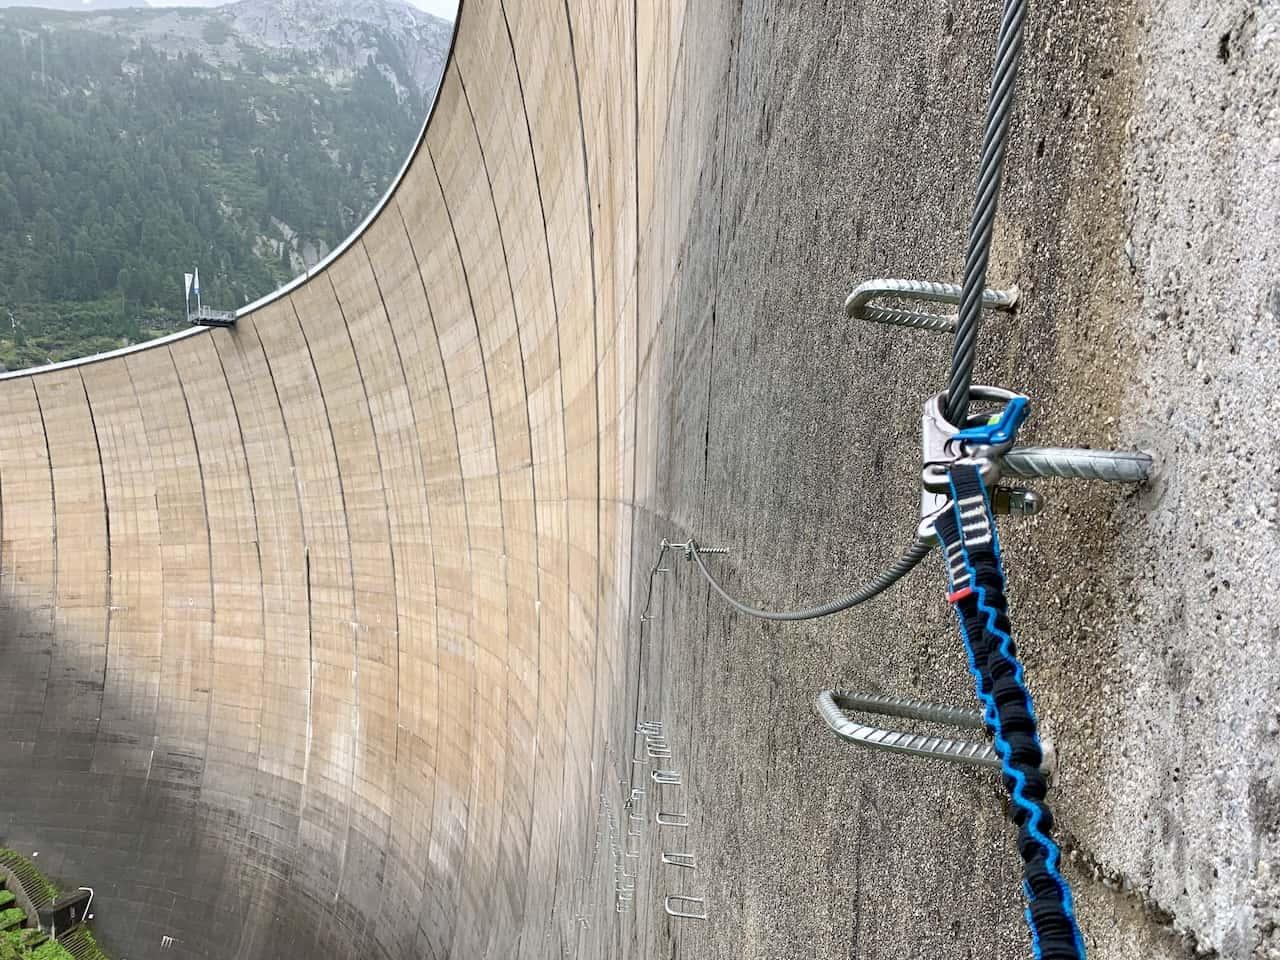 Via Ferrata Klettersteig Fixed Line Austria